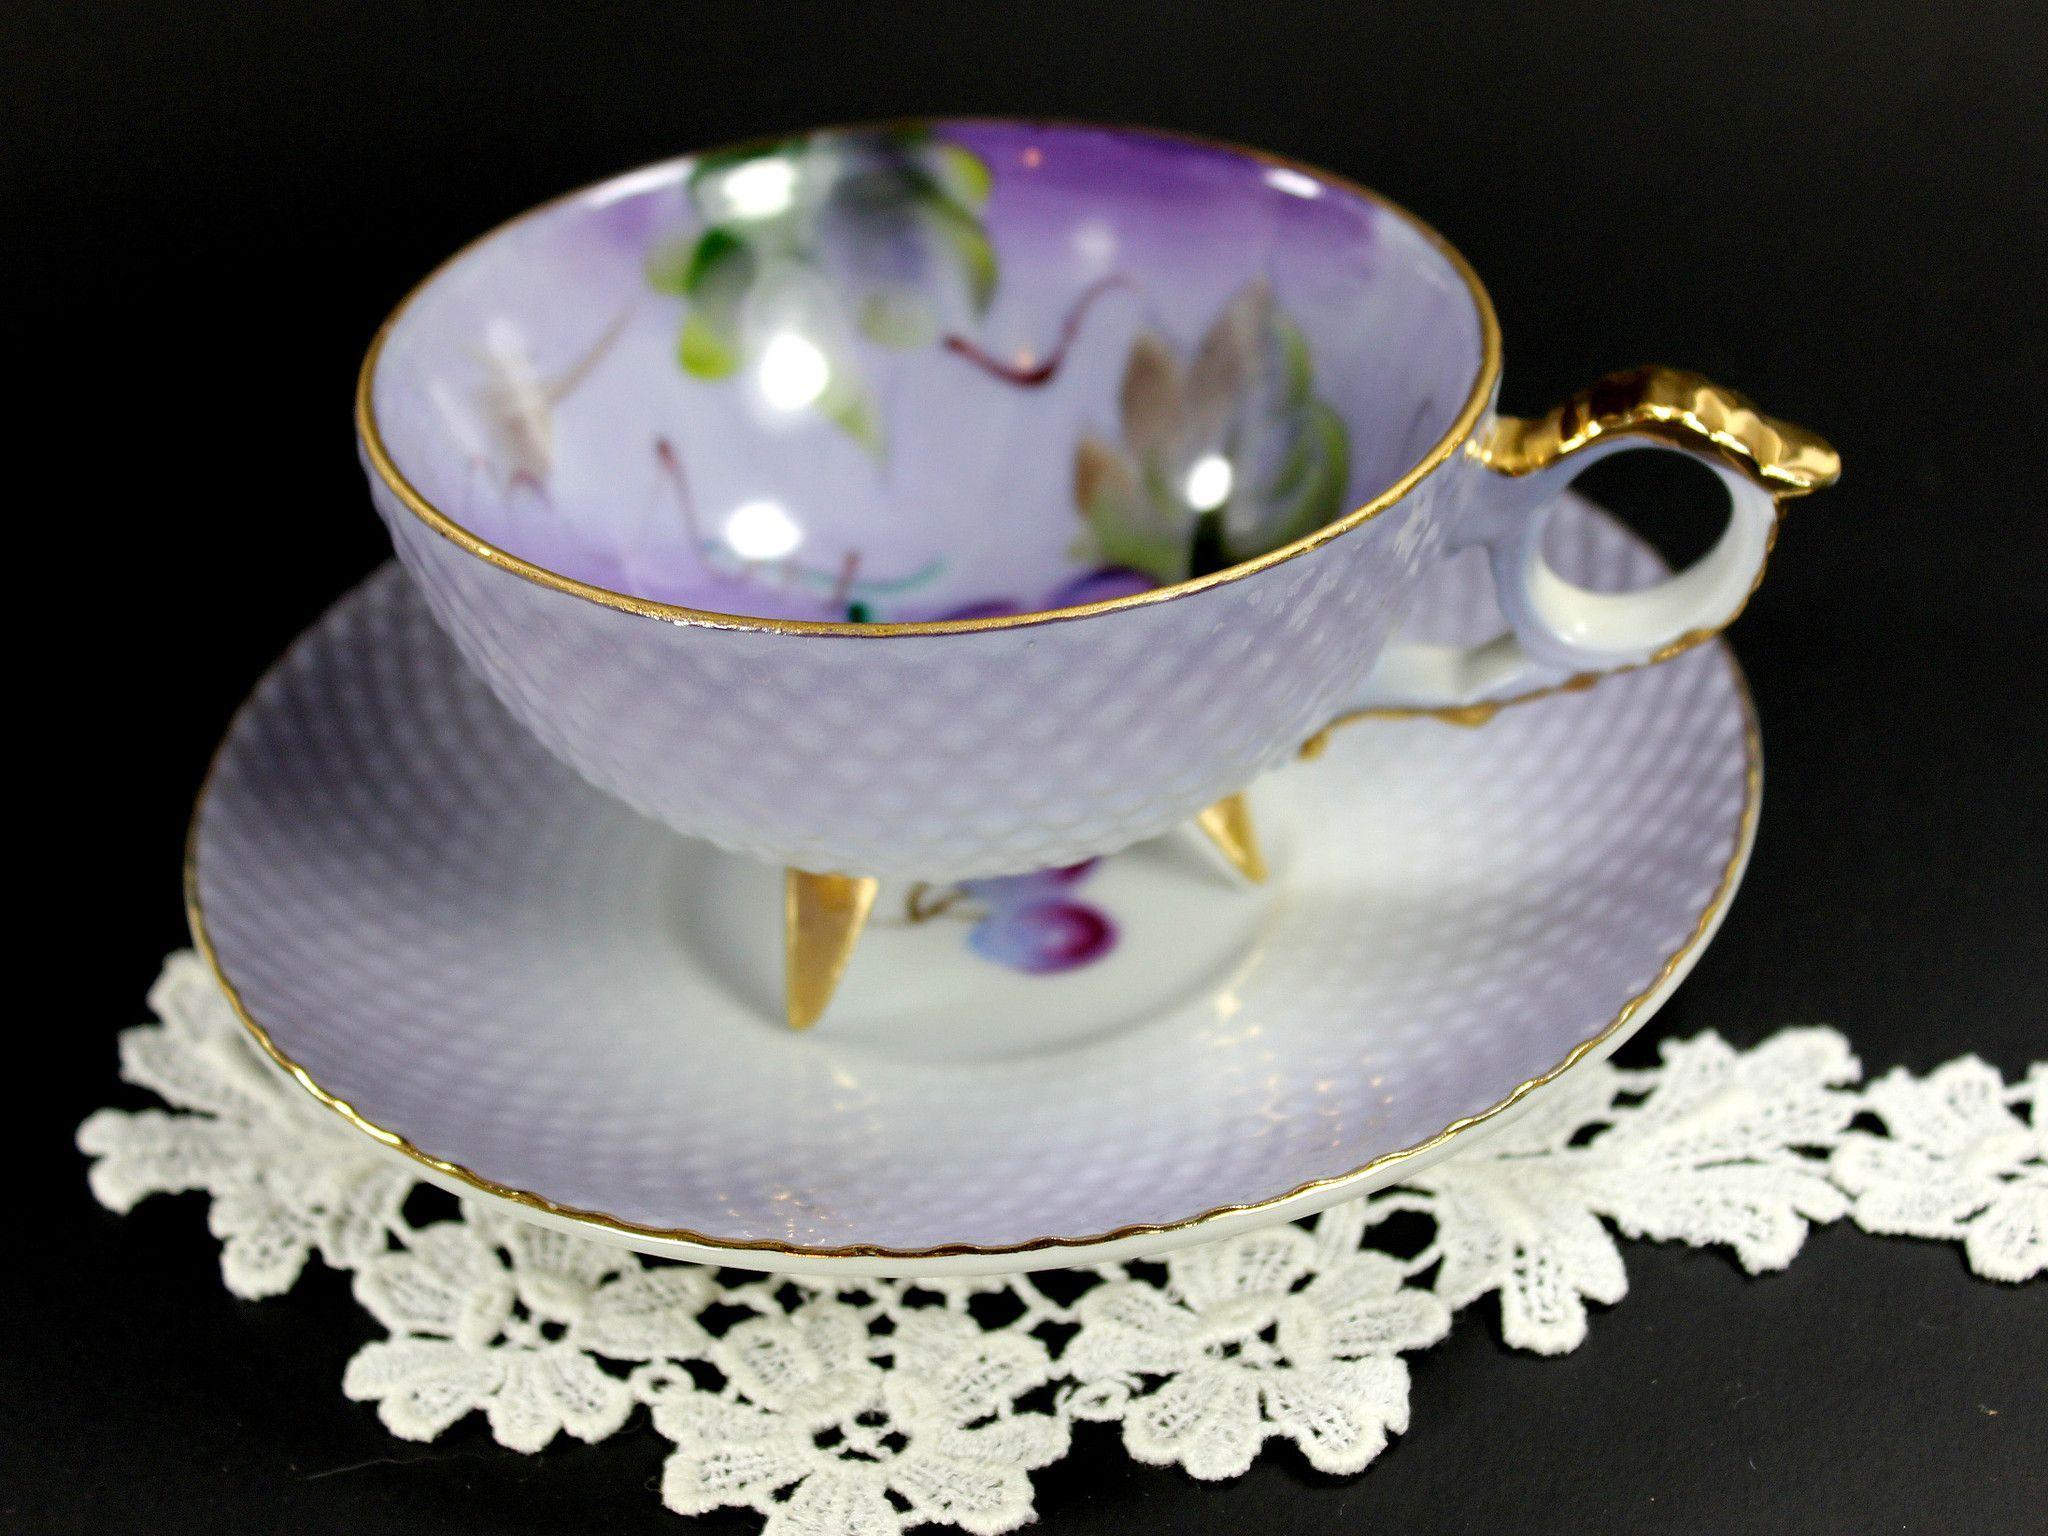 Lefton Three Footed Teacup, Hand Painted Vintage Tea Cup and Saucer 12 – The Vintage Teacup